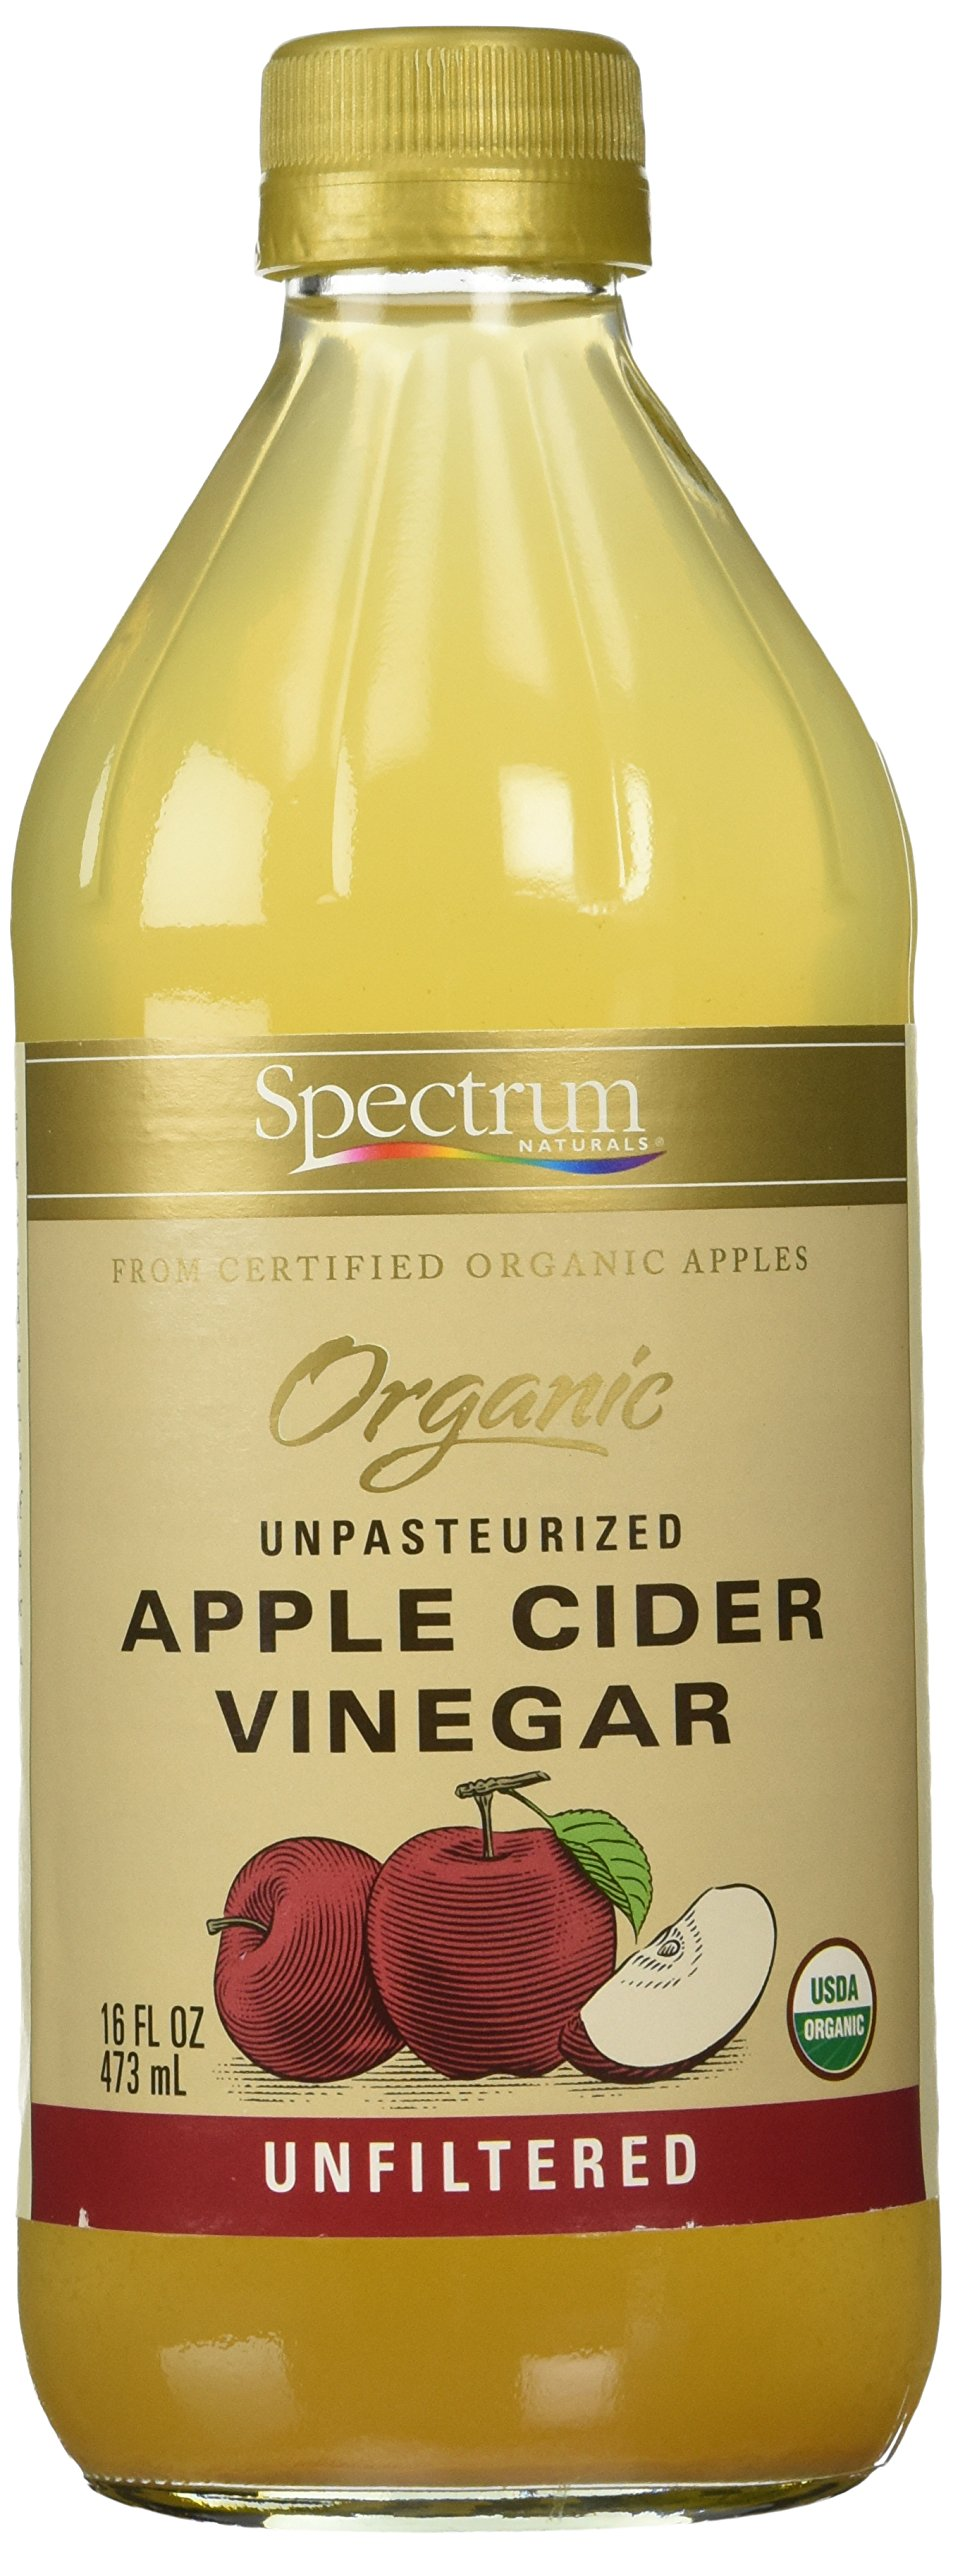 Spectrum Naturals Organic Apple Cider Vinegar, Unfiltered, 16 oz